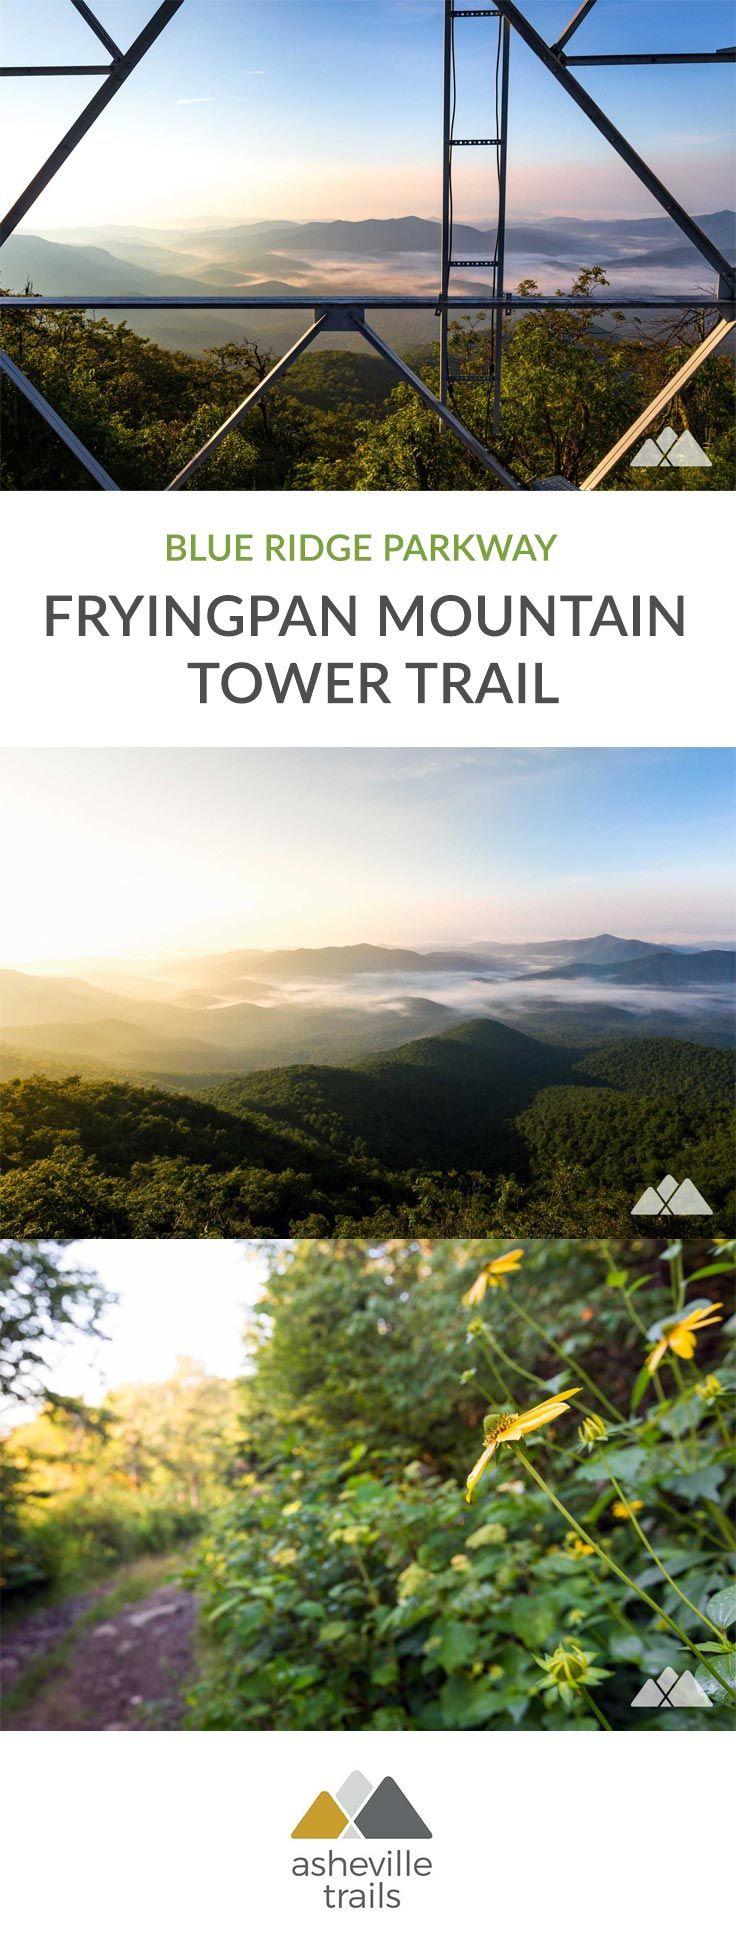 Fryingpan Mountain Tower Trail On The Blue Ridge Parkway Blue Ridge Parkway Blue Ridge North Carolina Hiking